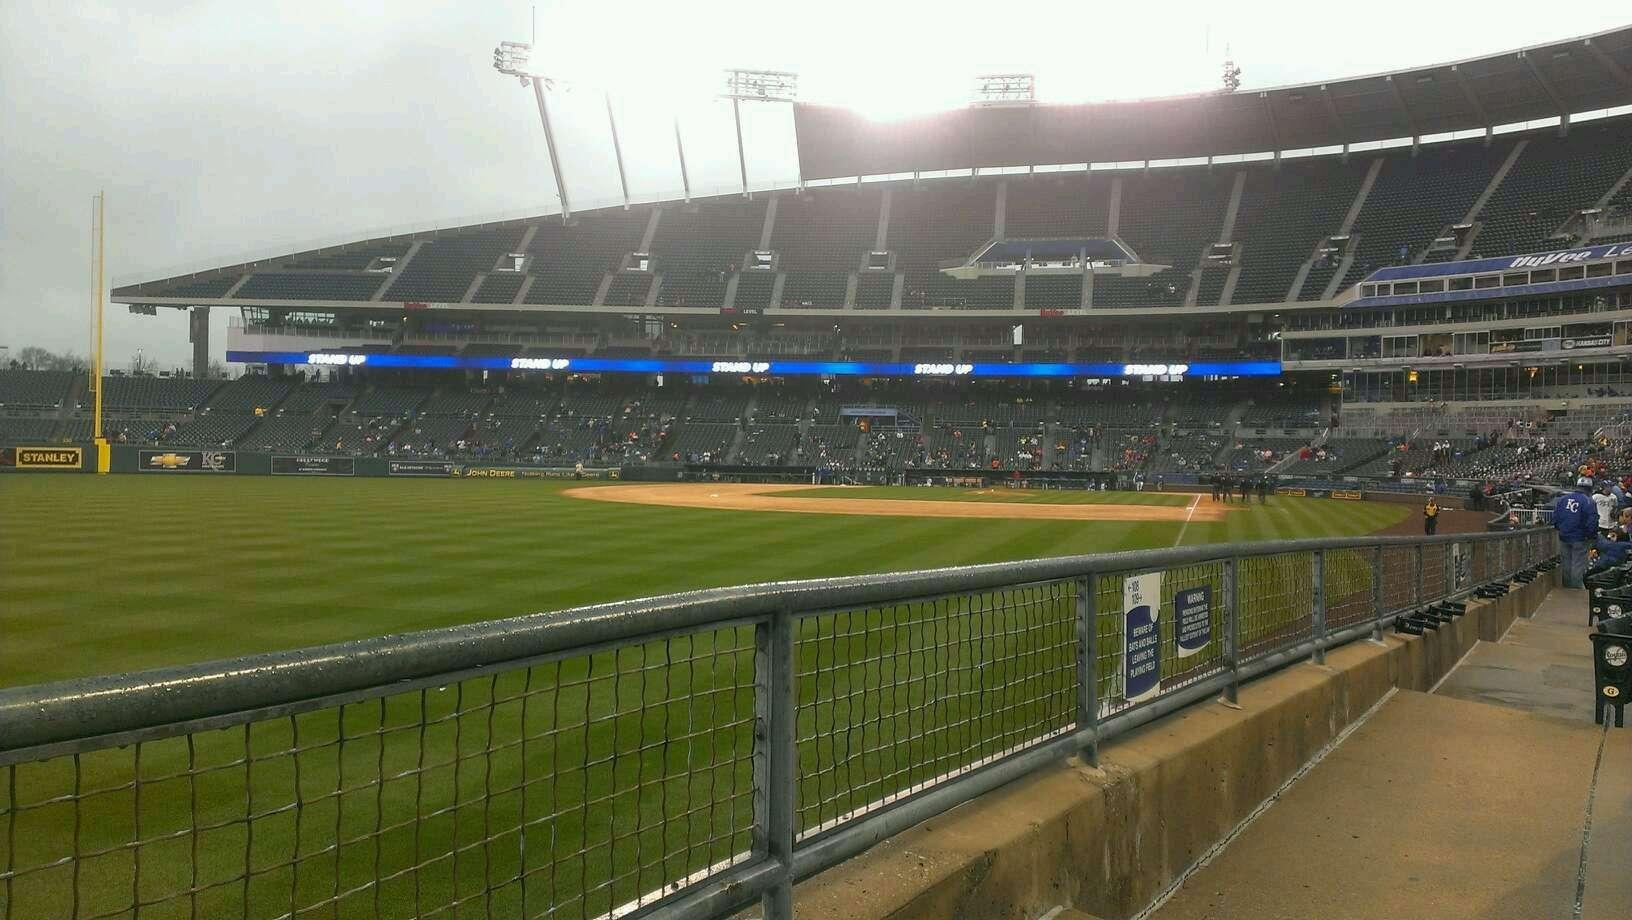 Kauffman Stadium Section 108 - RateYourSeats.com